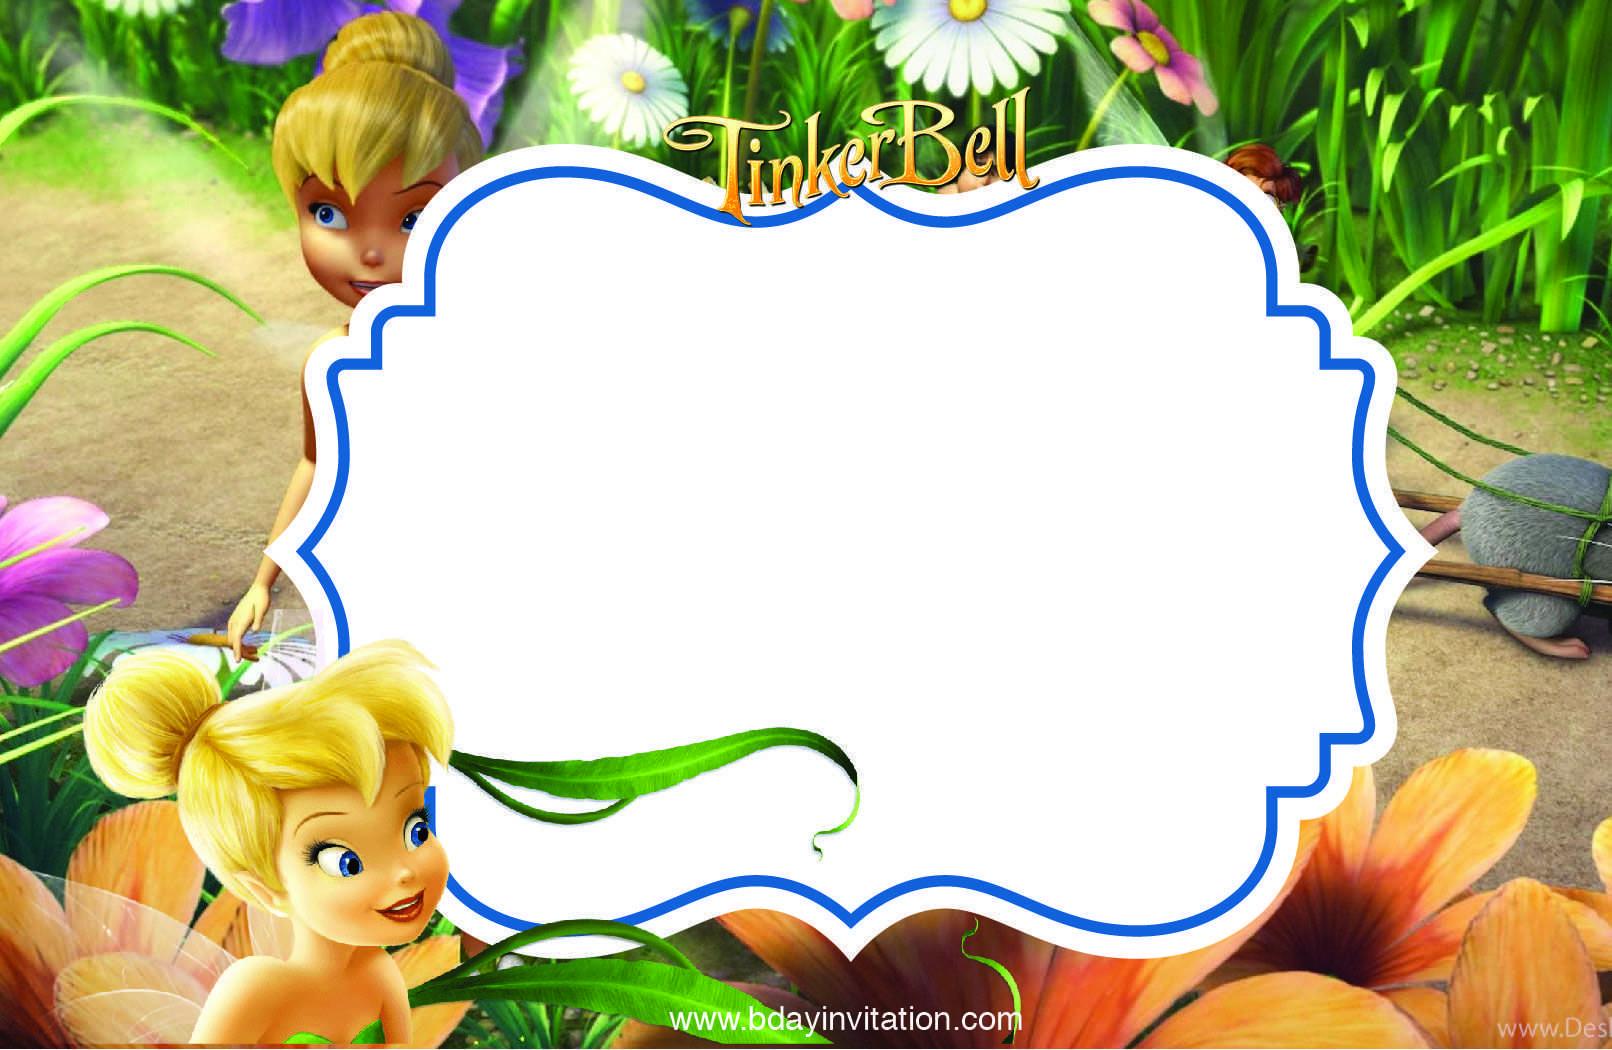 40 Online Birthday Invitation Templates Disney Princess Maker with Birthday Invitation Templates Disney Princess